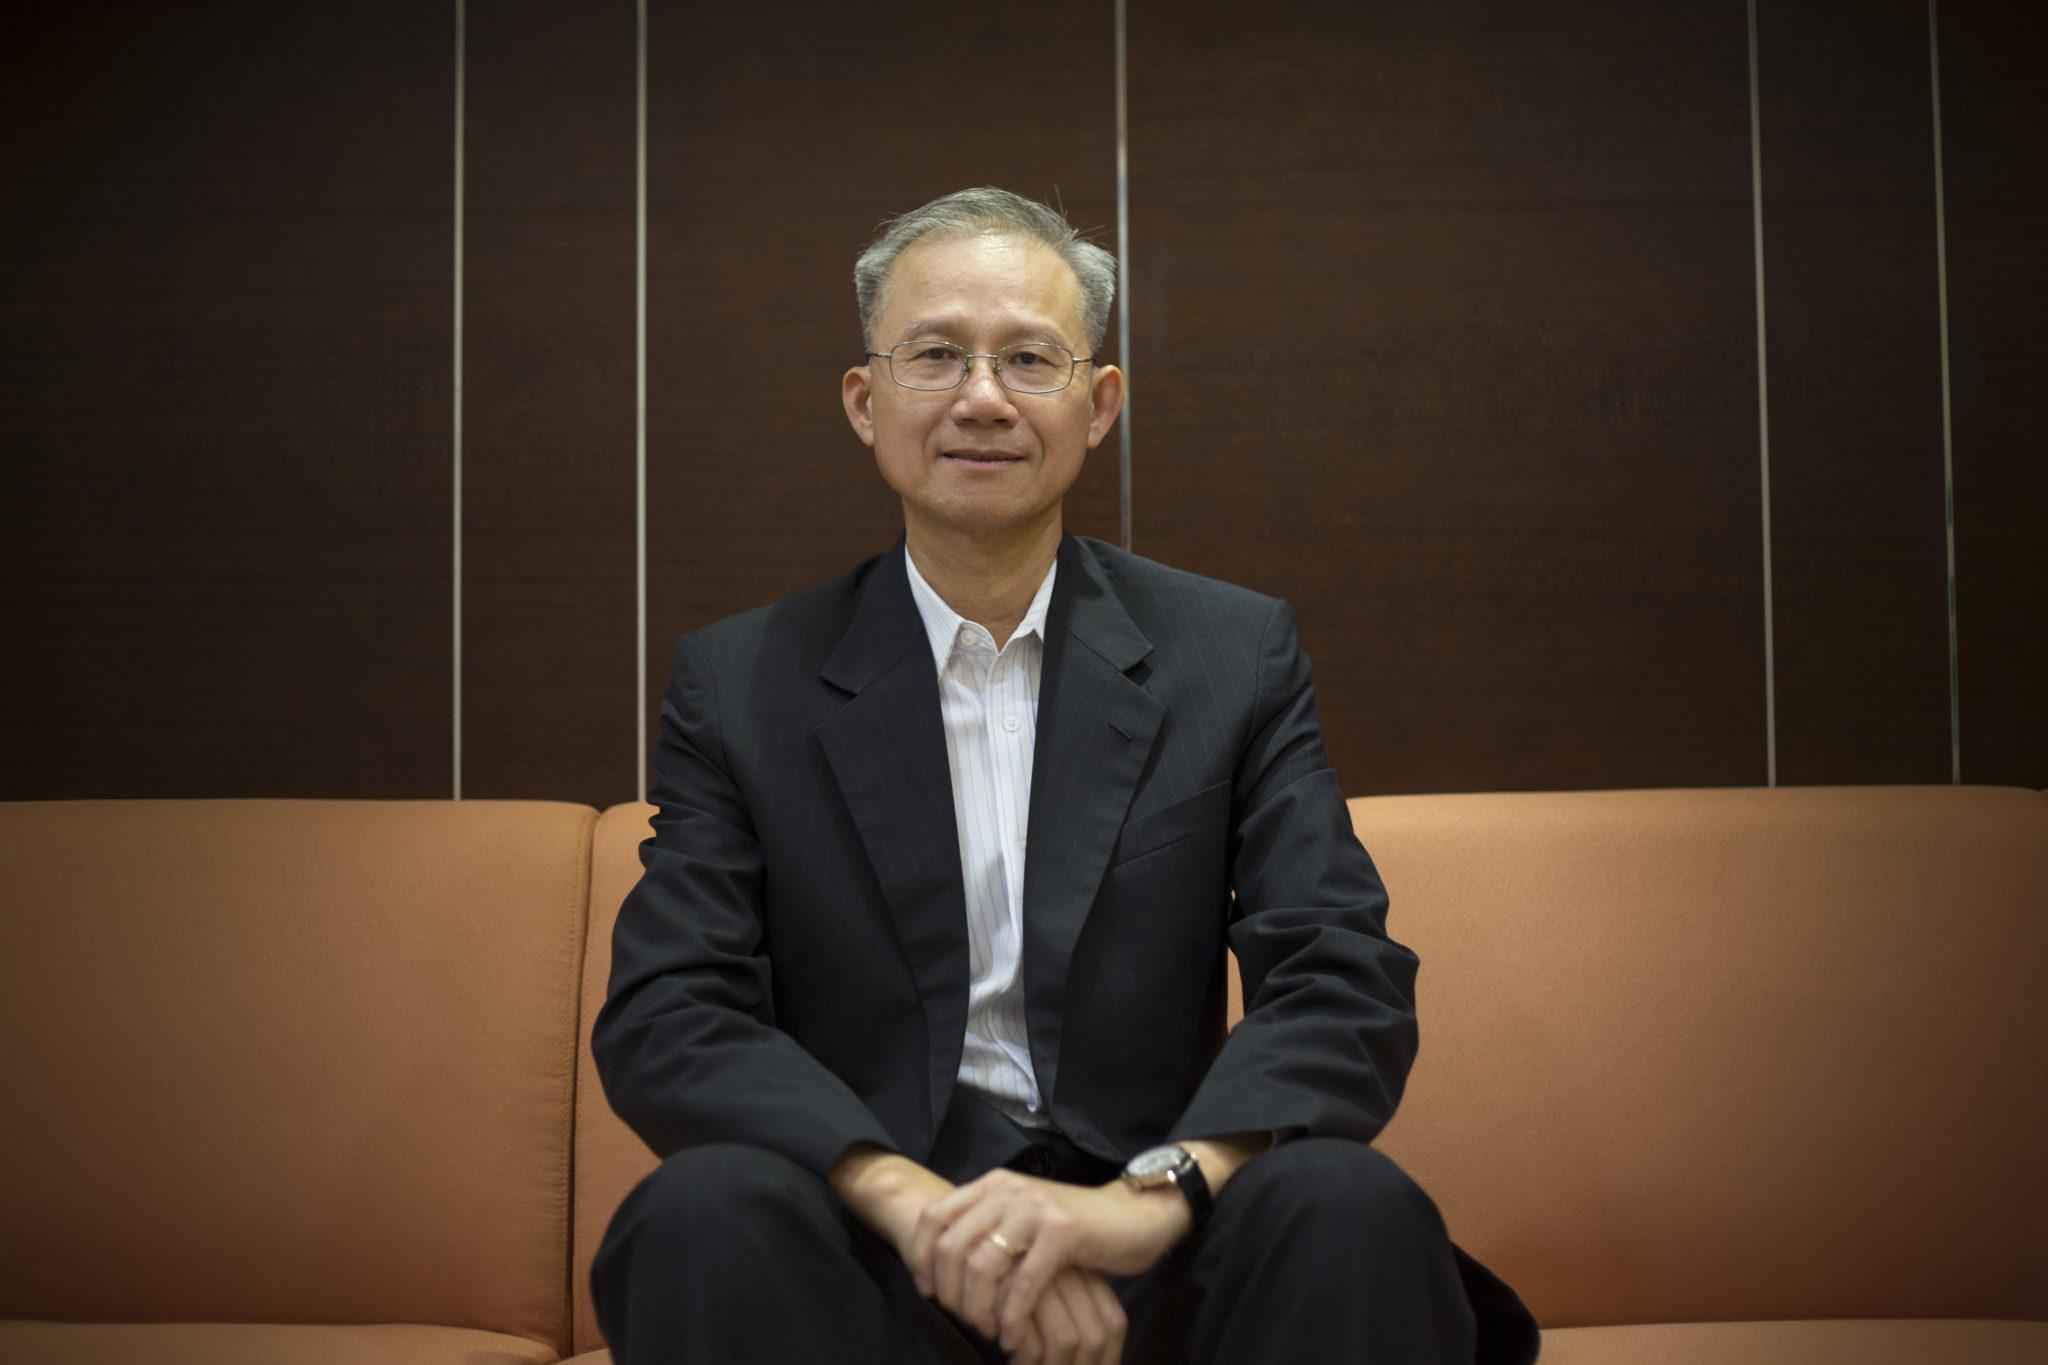 Zhuhai | Vong Hin Fai e Paula Lin directores do Tribunal de Arbitragem